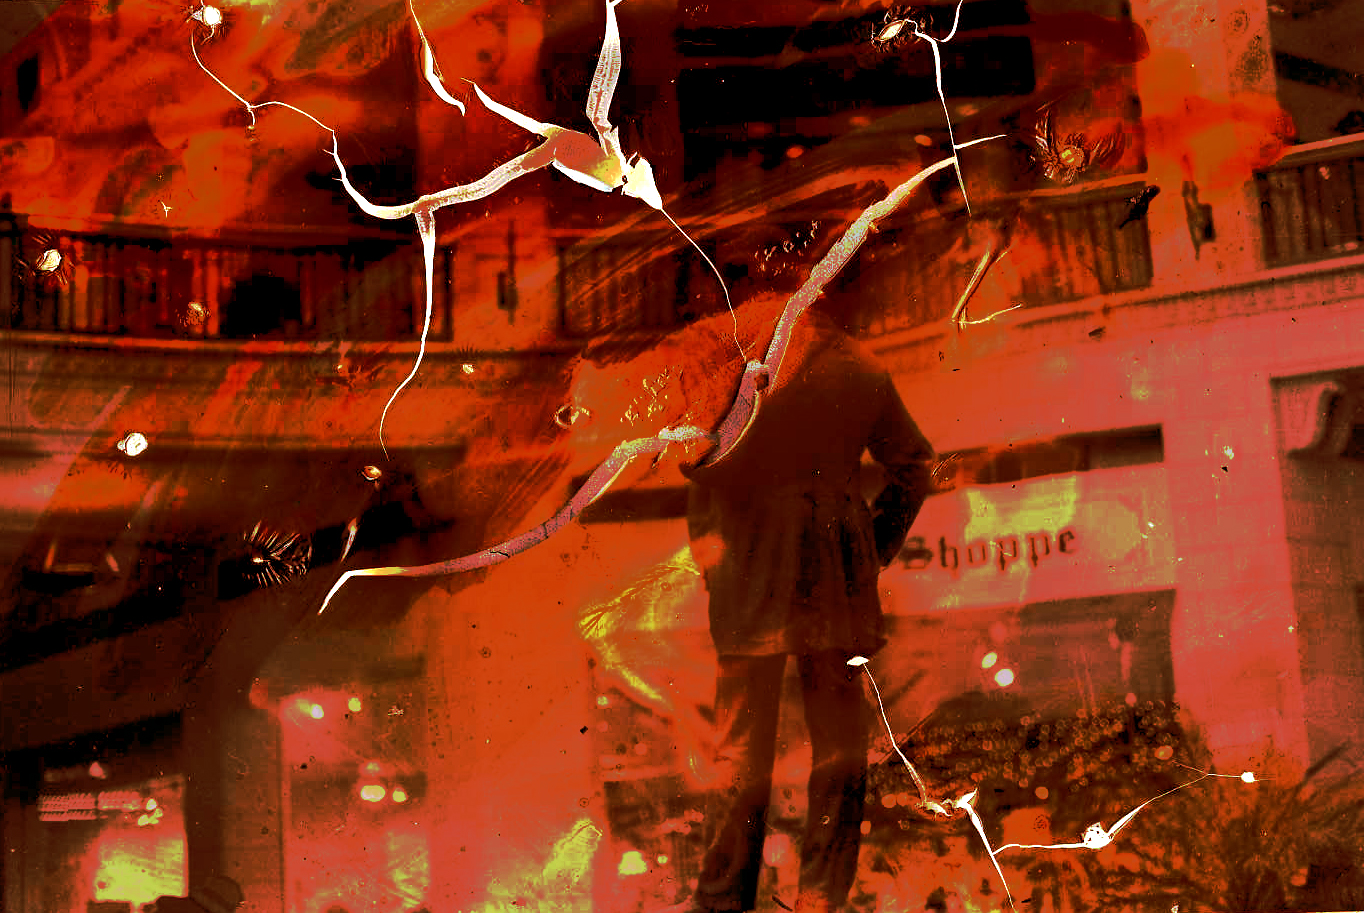 Heat_Shot_07.jpg